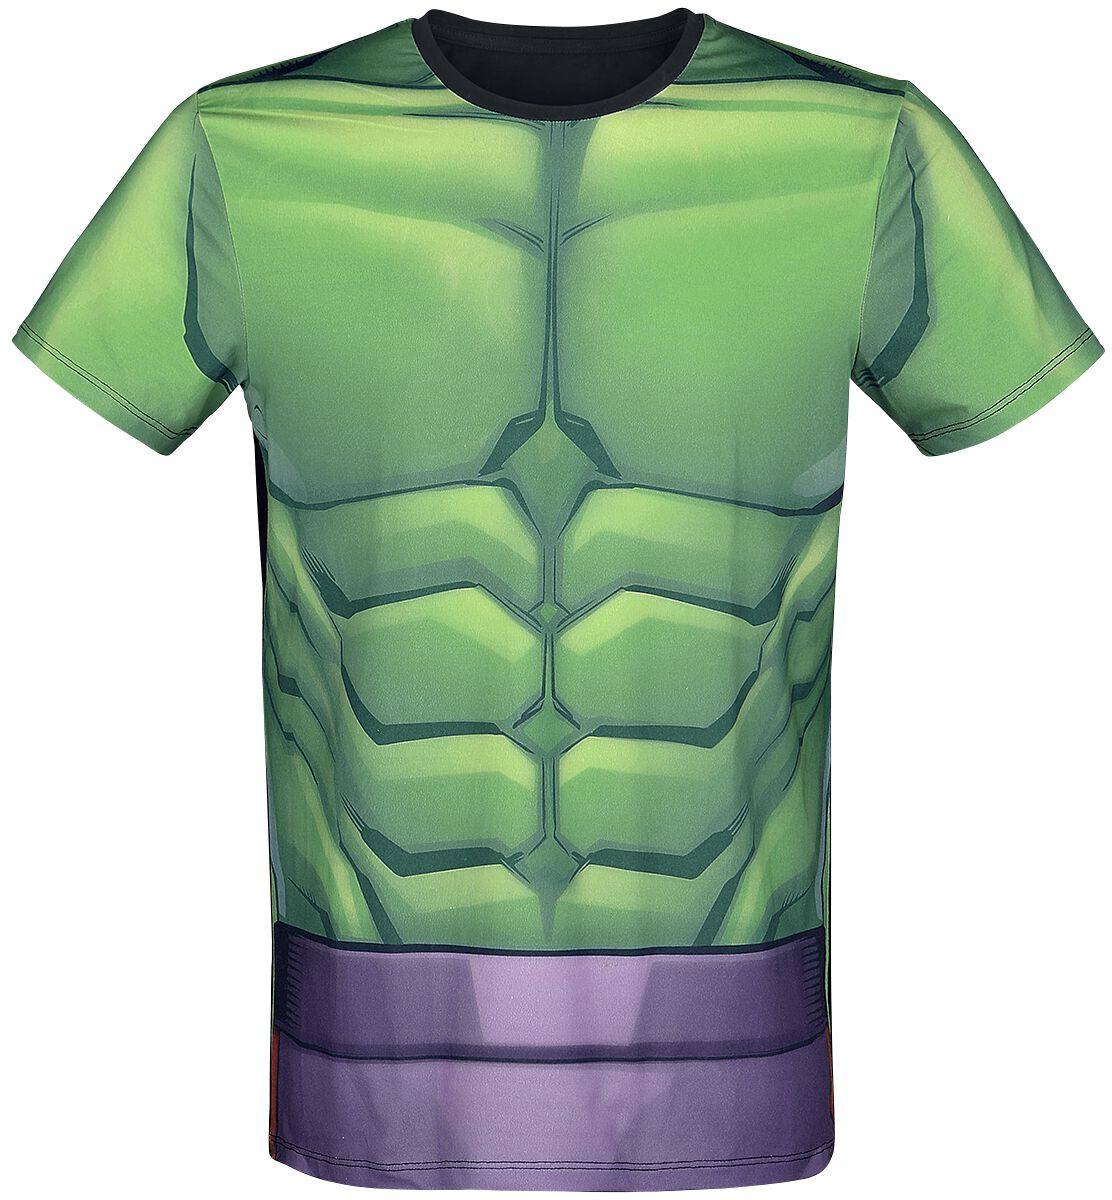 Merch dla Fanów - Koszulki - T-Shirt Hulk Cosplay T-Shirt wielokolorowy - 372191